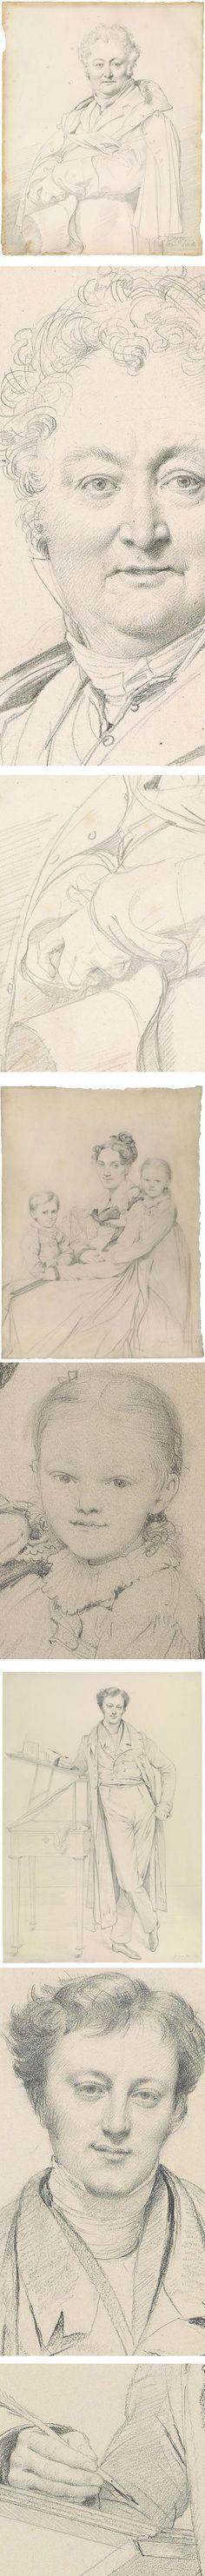 Ingres at the Morgan, graphite drwaings of ean-Auguste-Dominique Ingres